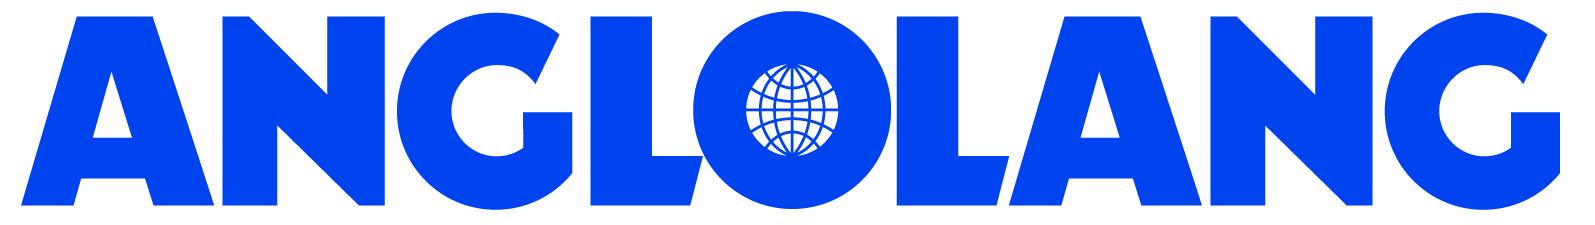 Лого_Англоланд